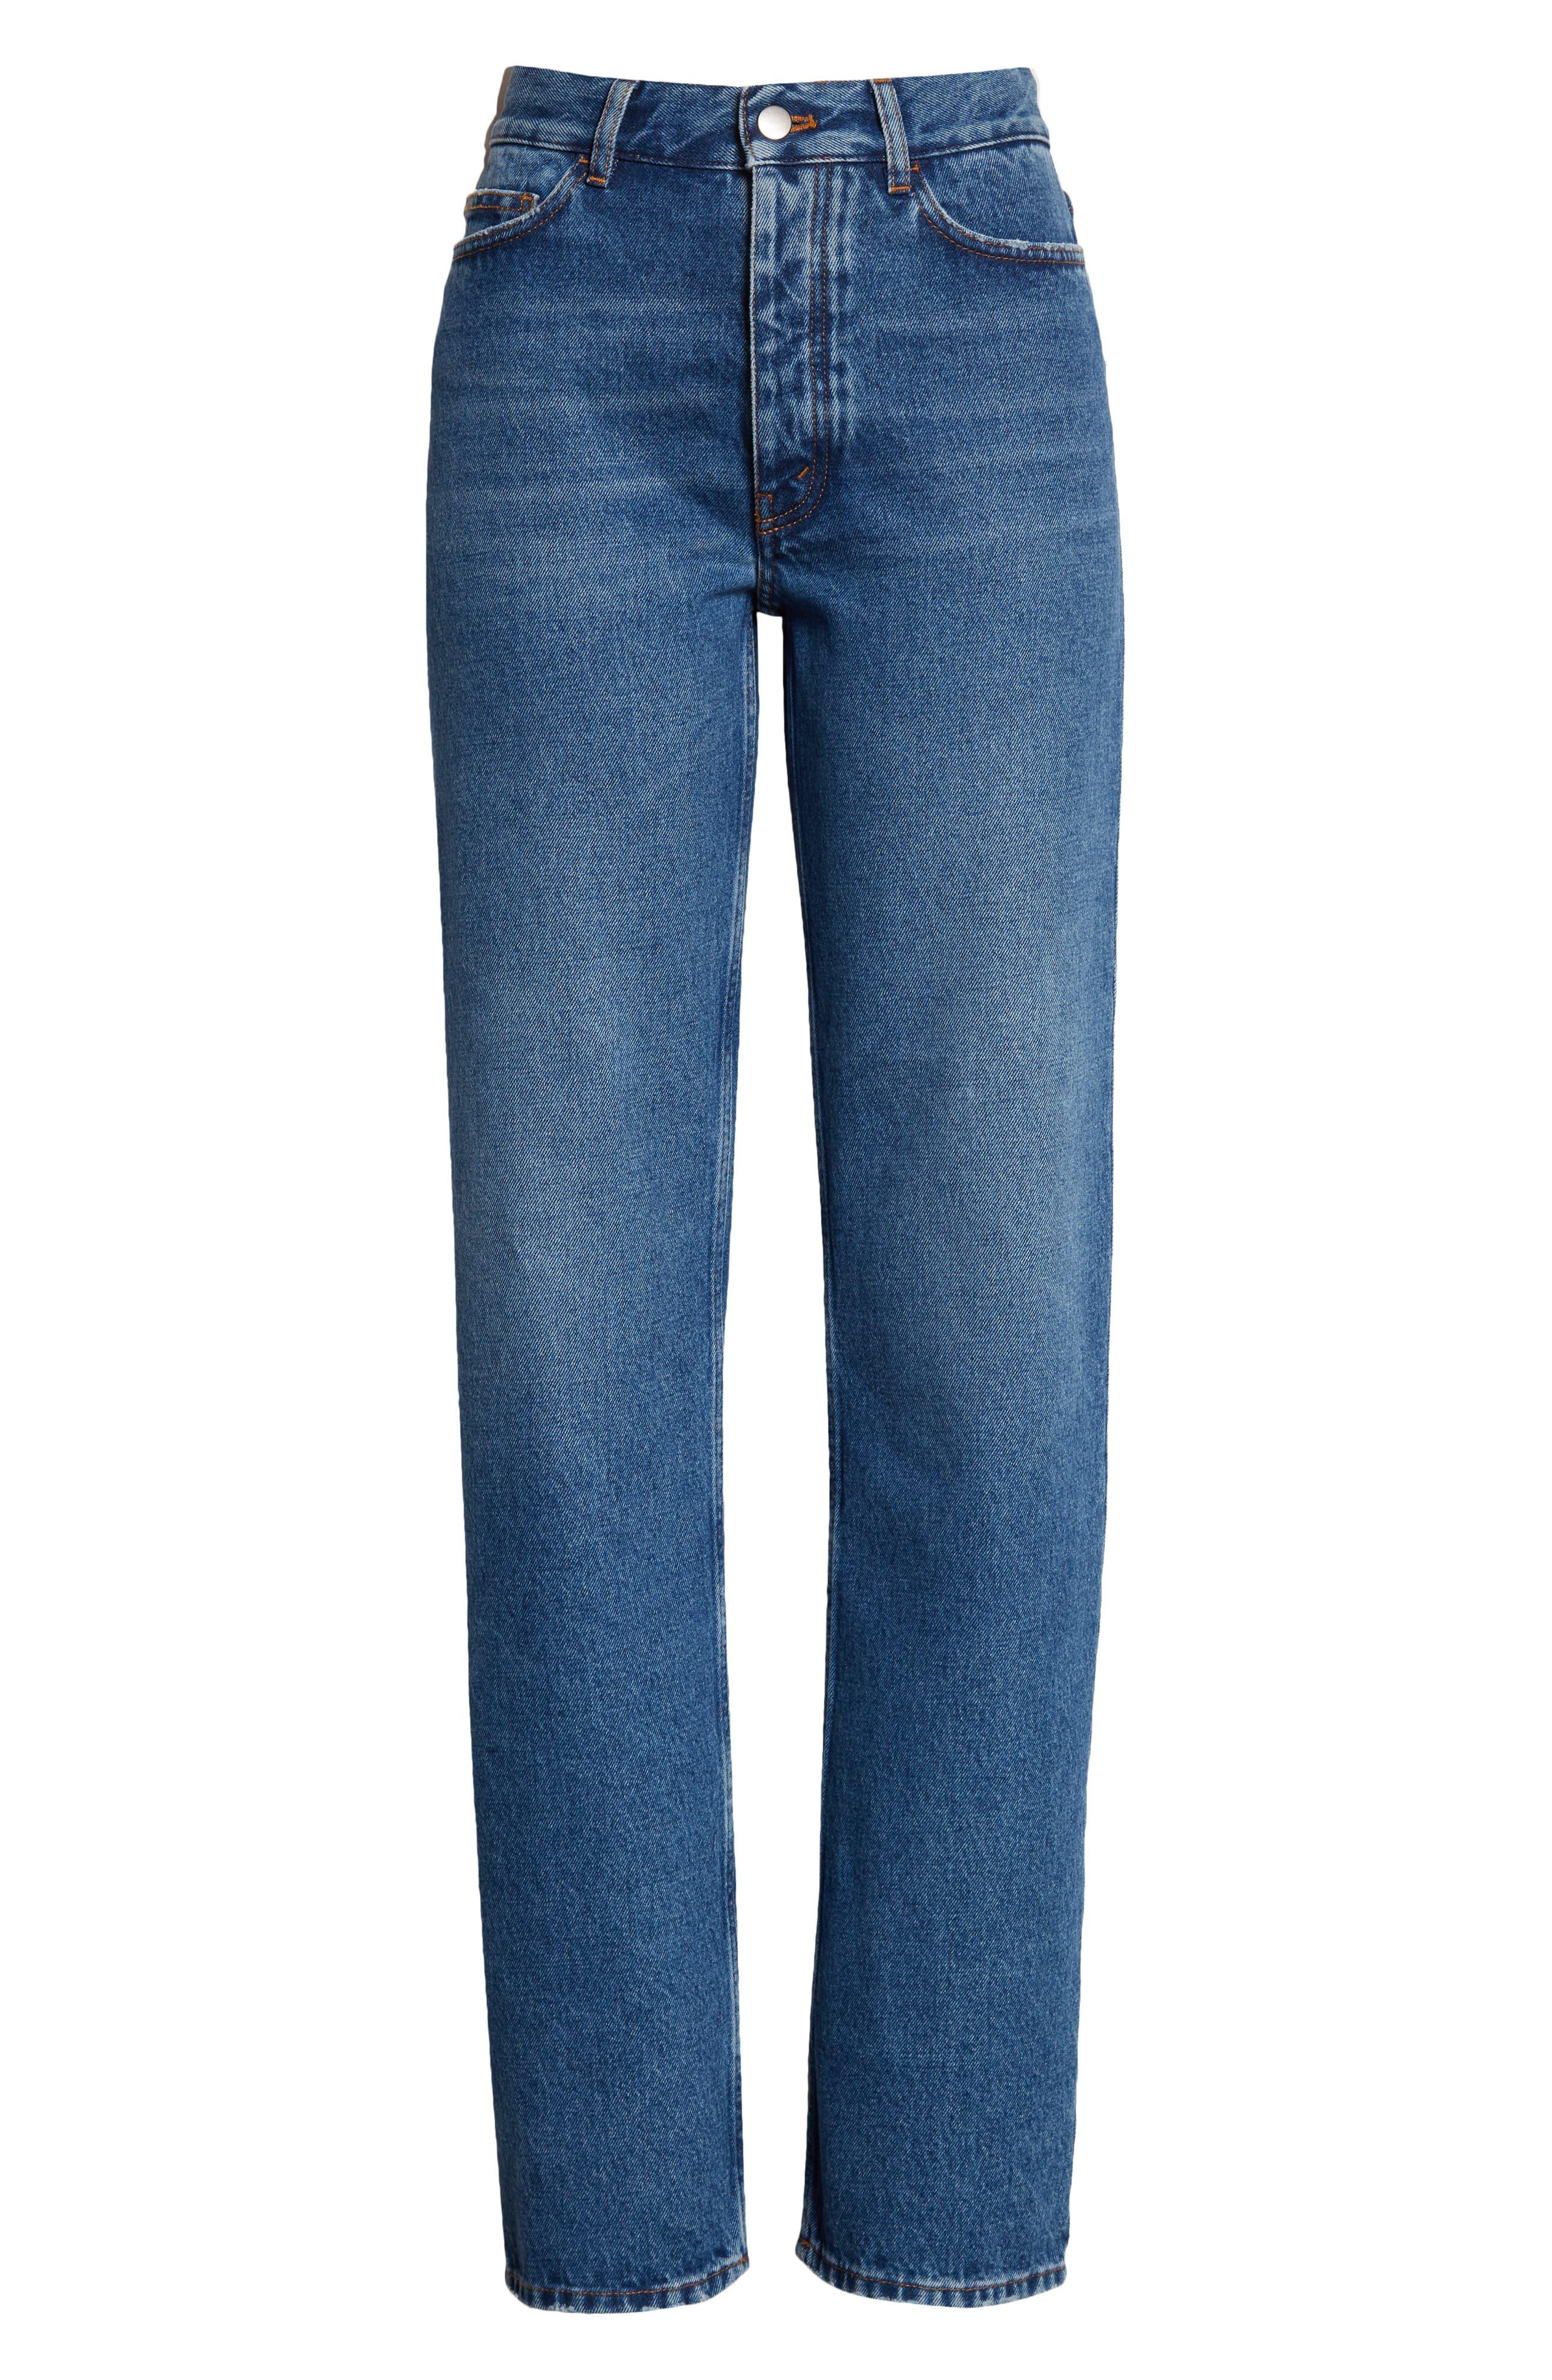 High Waist Straight Leg Boyfriend Jeans